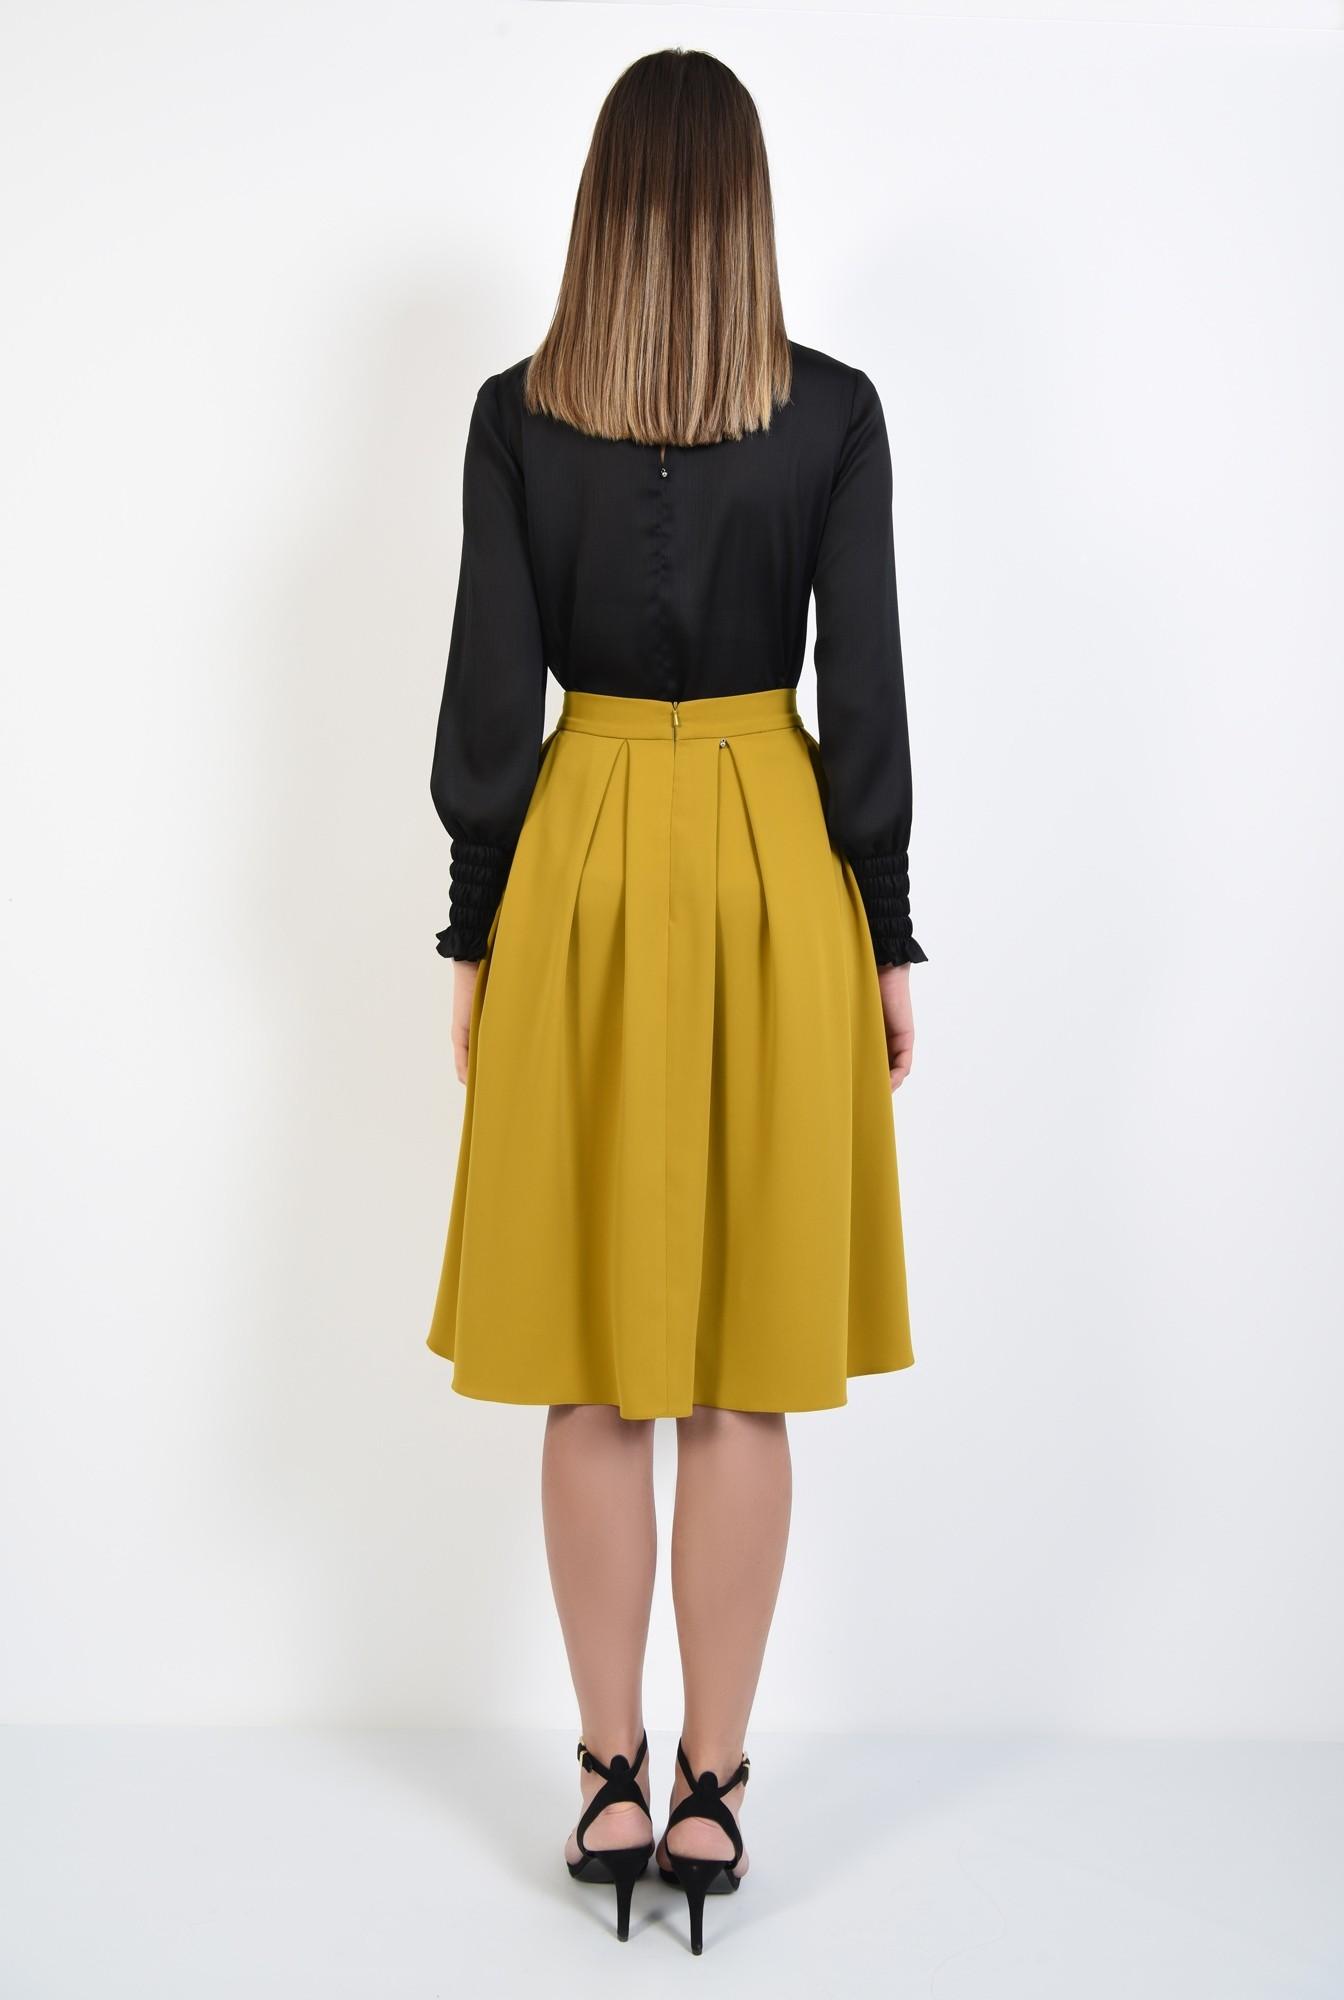 1 - 360 - fusta mustar, galben, pliseuri, talie inalta cu betelie